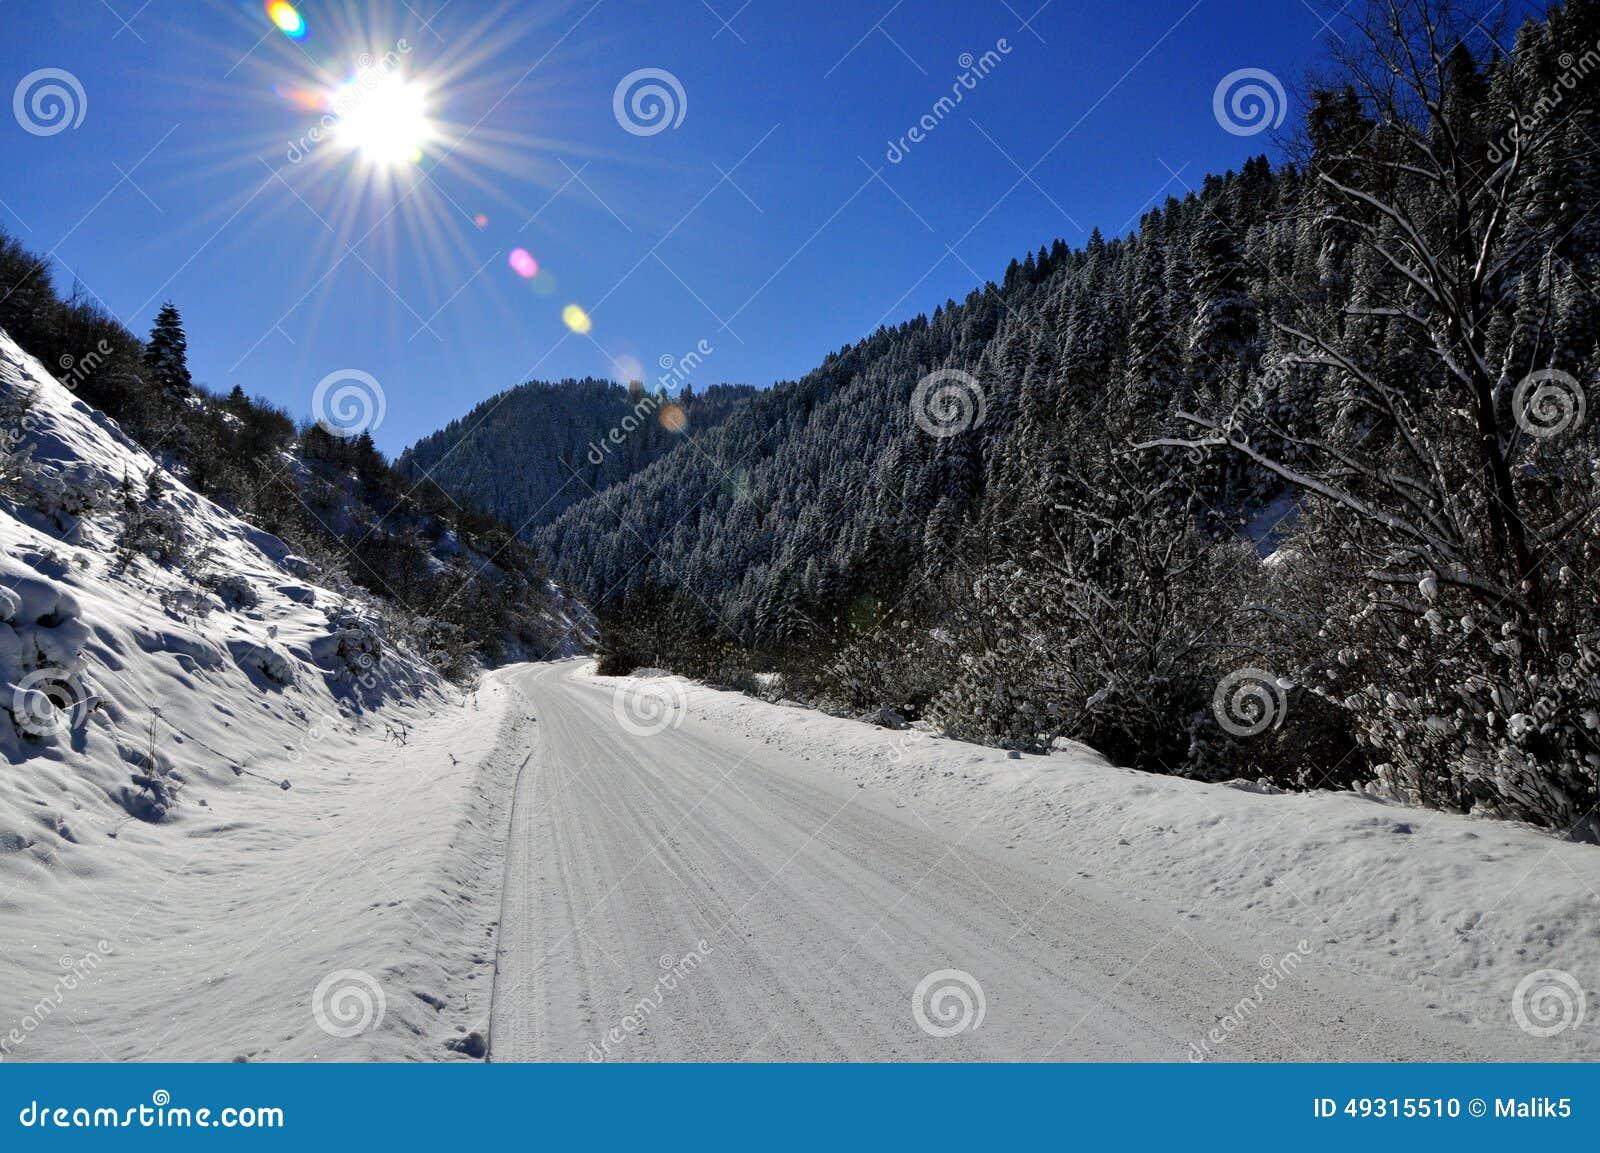 Winter landscep photo